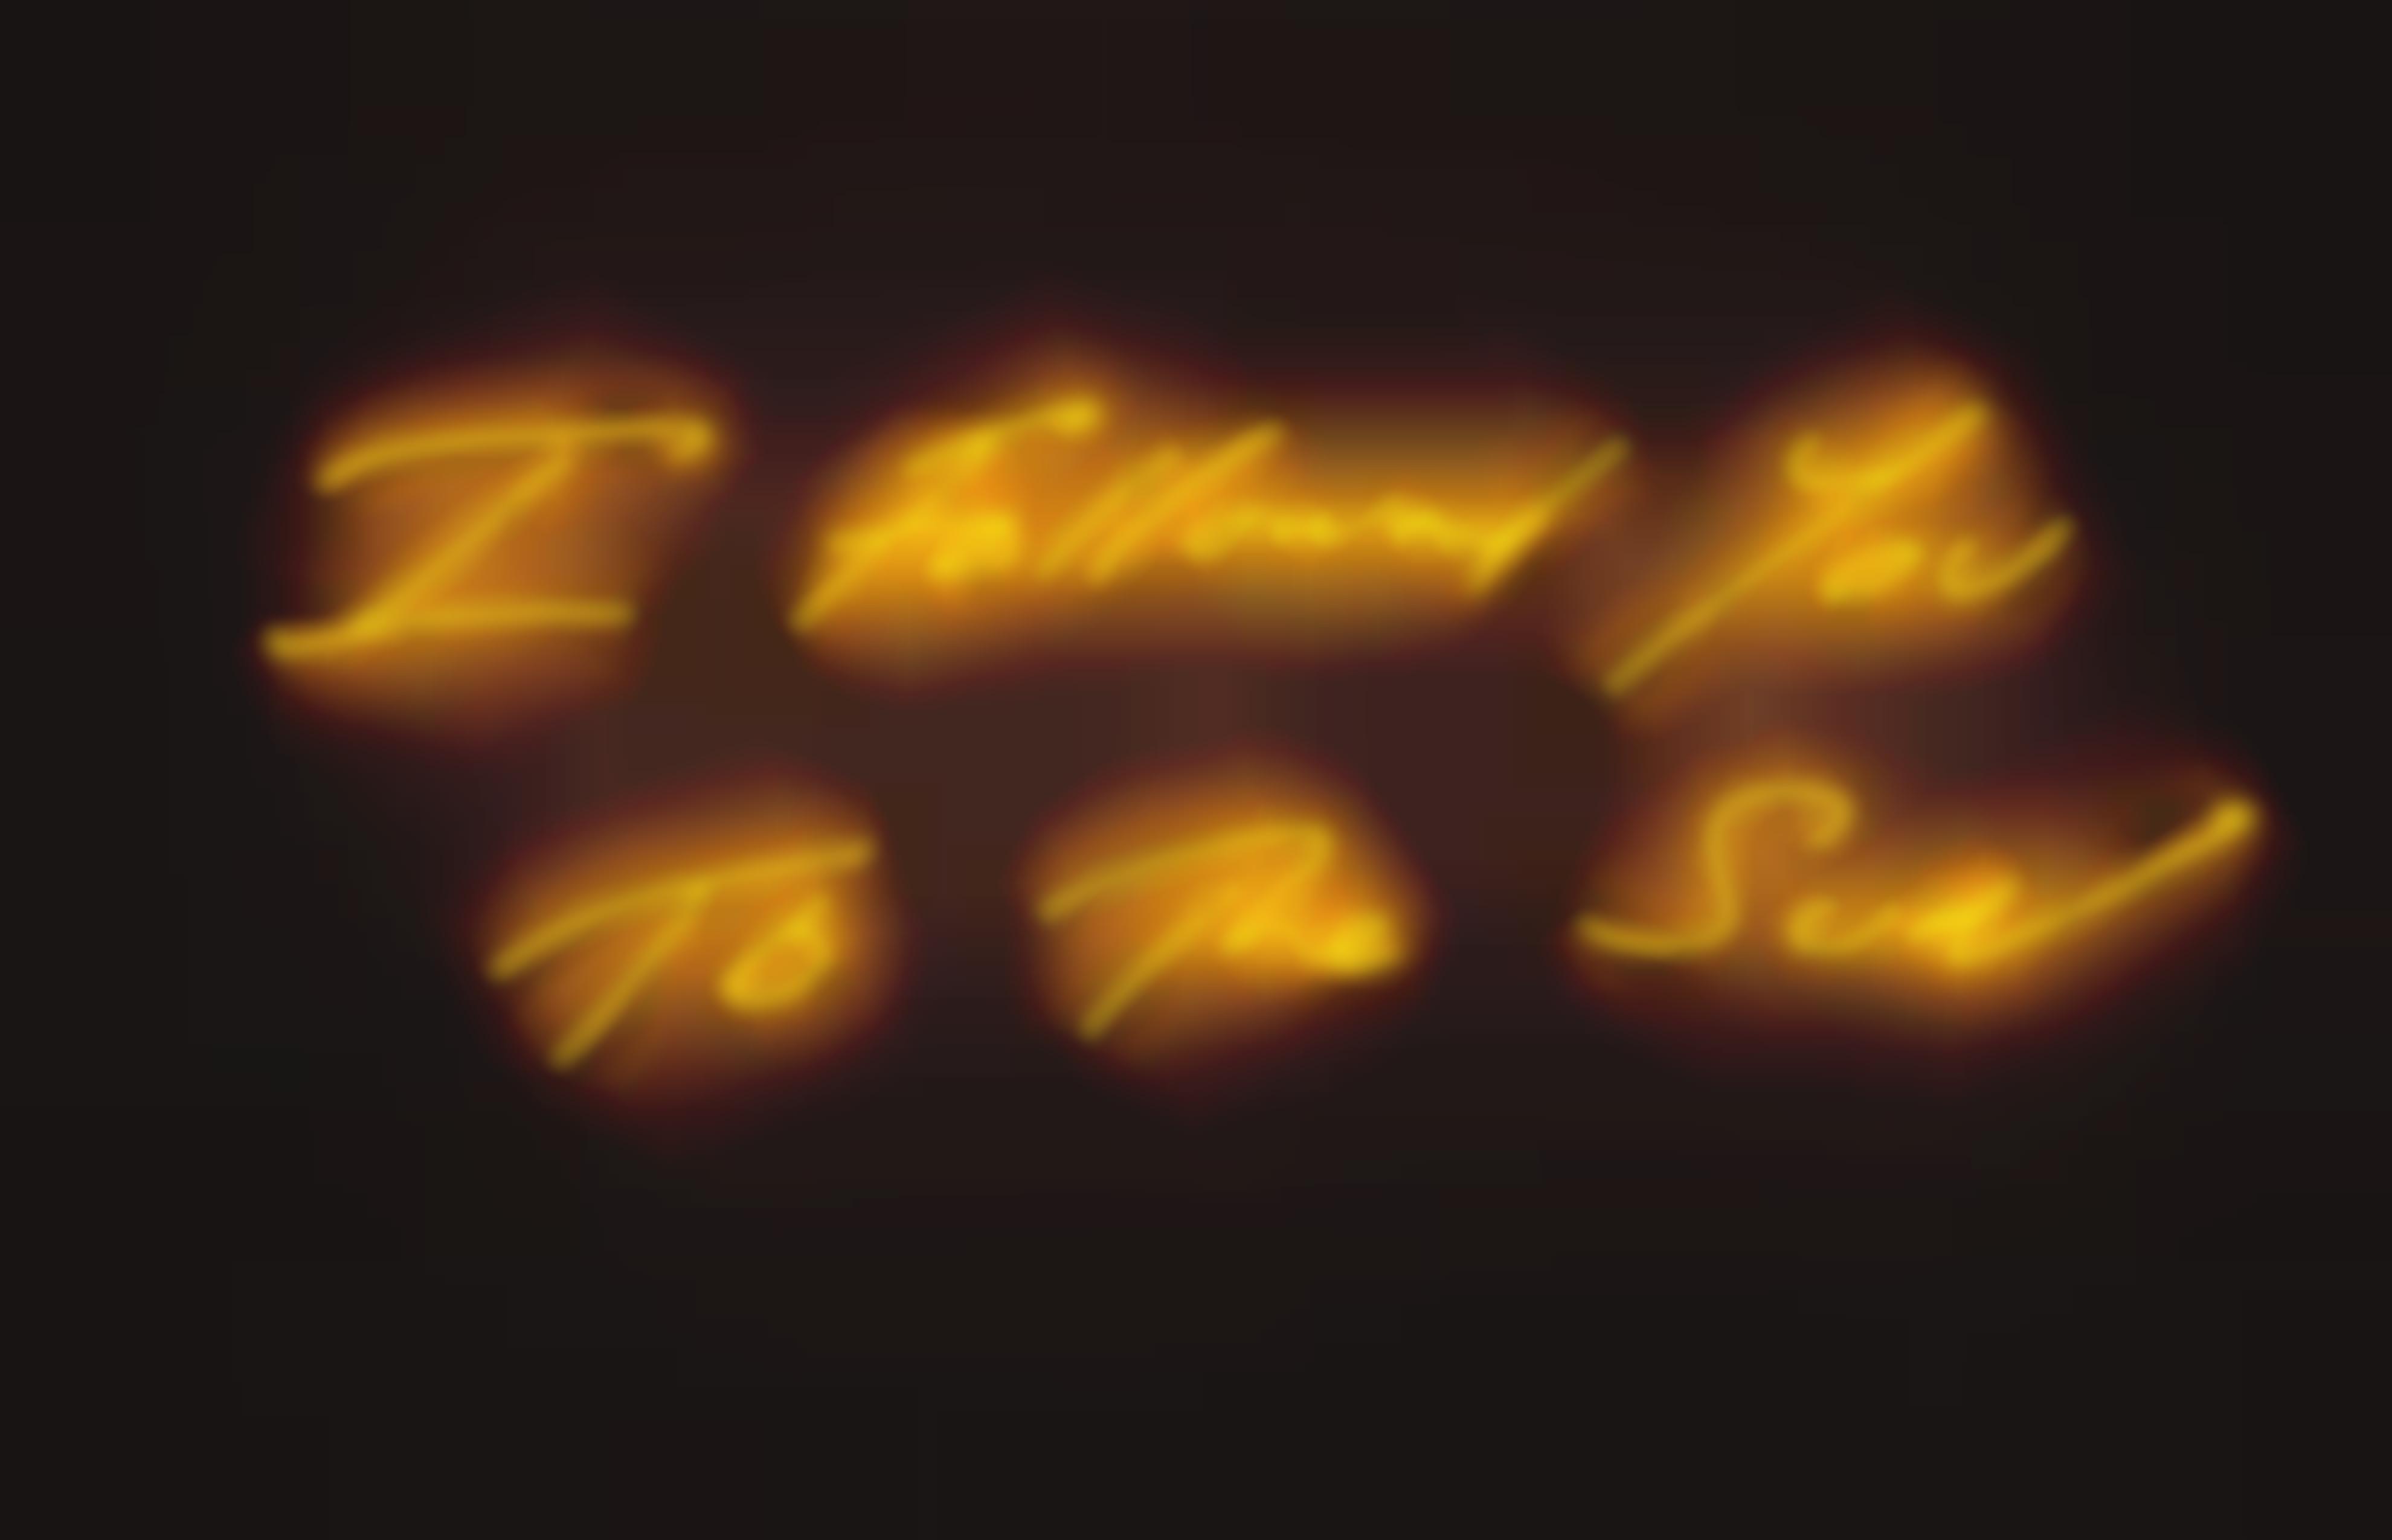 Tracey Emin-I Followed You To The Sun-2013